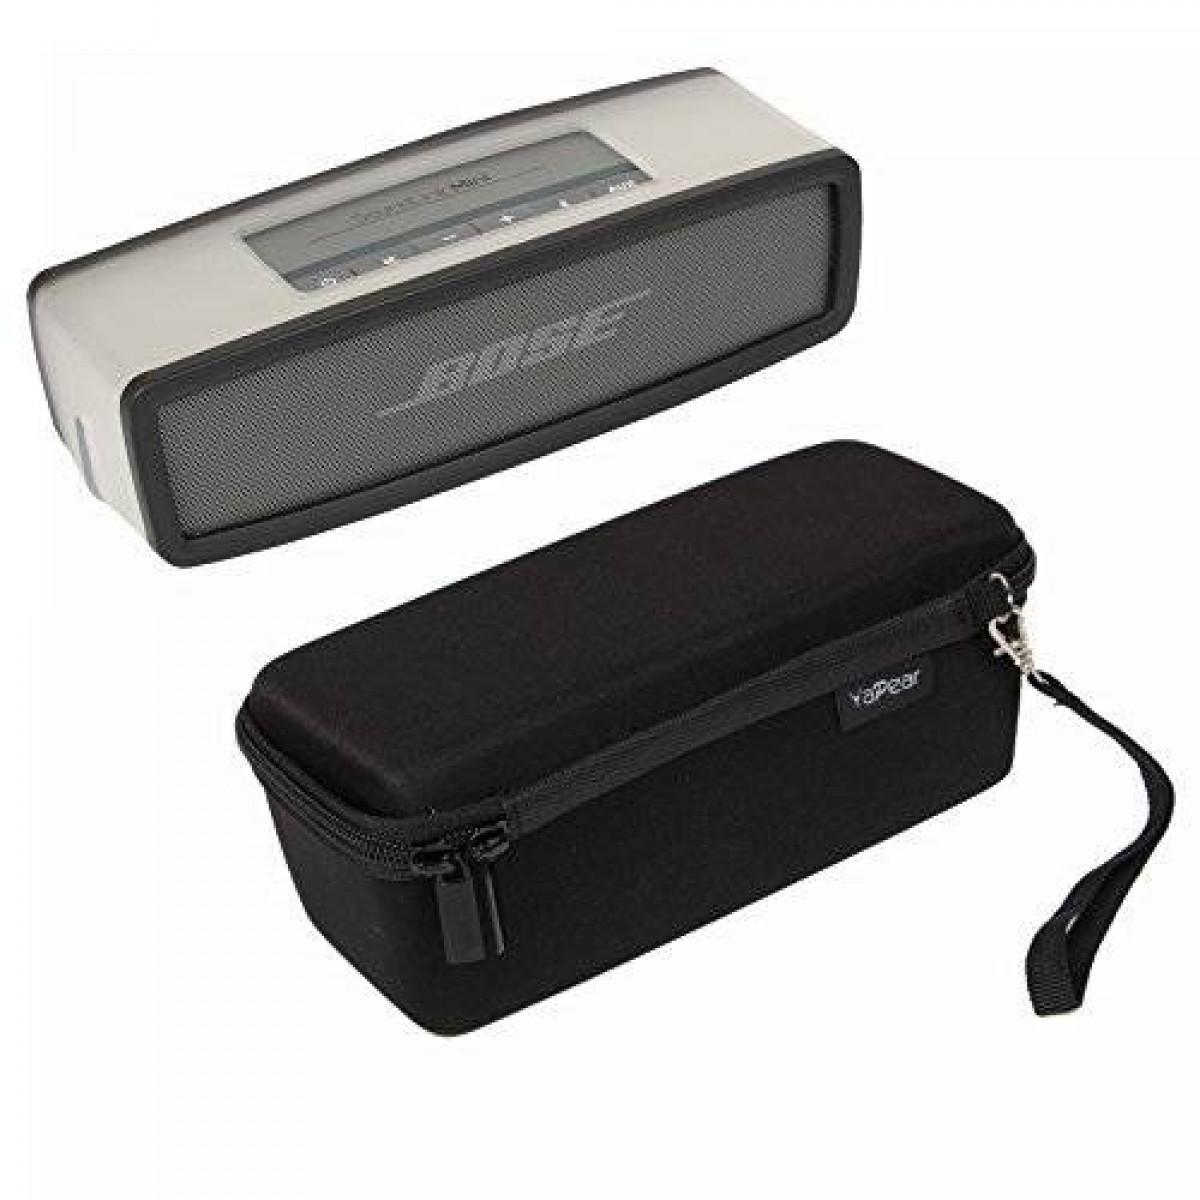 soundlink mini bluetooth speaker travel bag